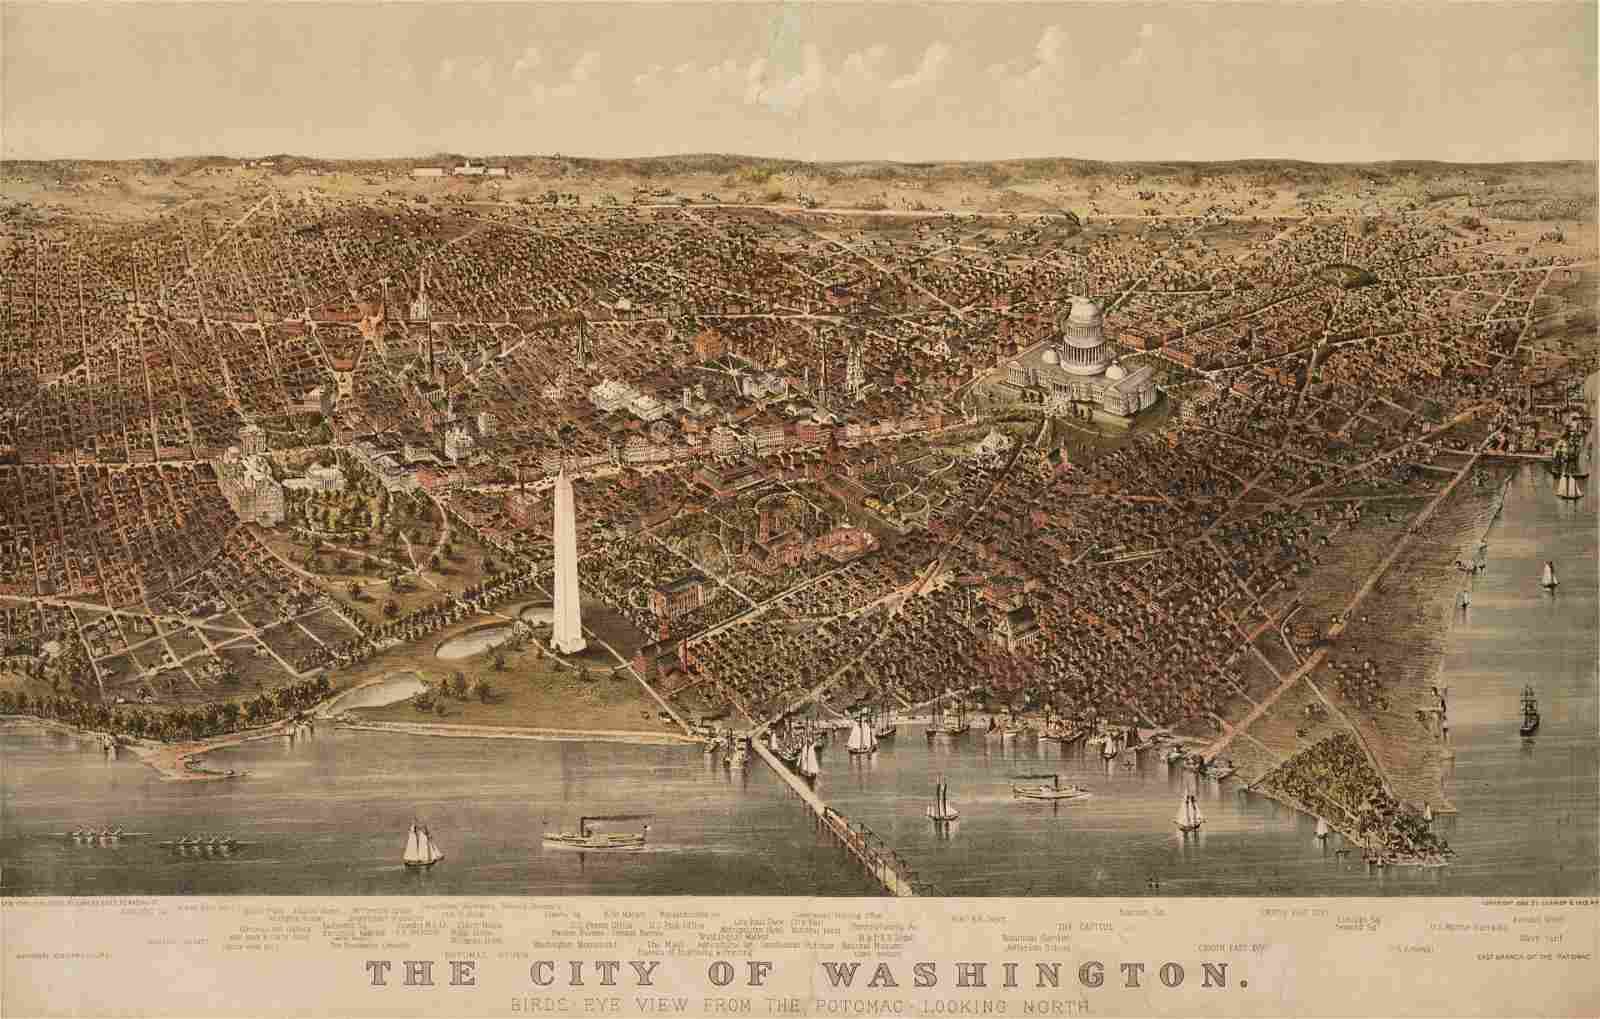 [WASHINGTON D. C.]. CURRIER & IVES, publishers.